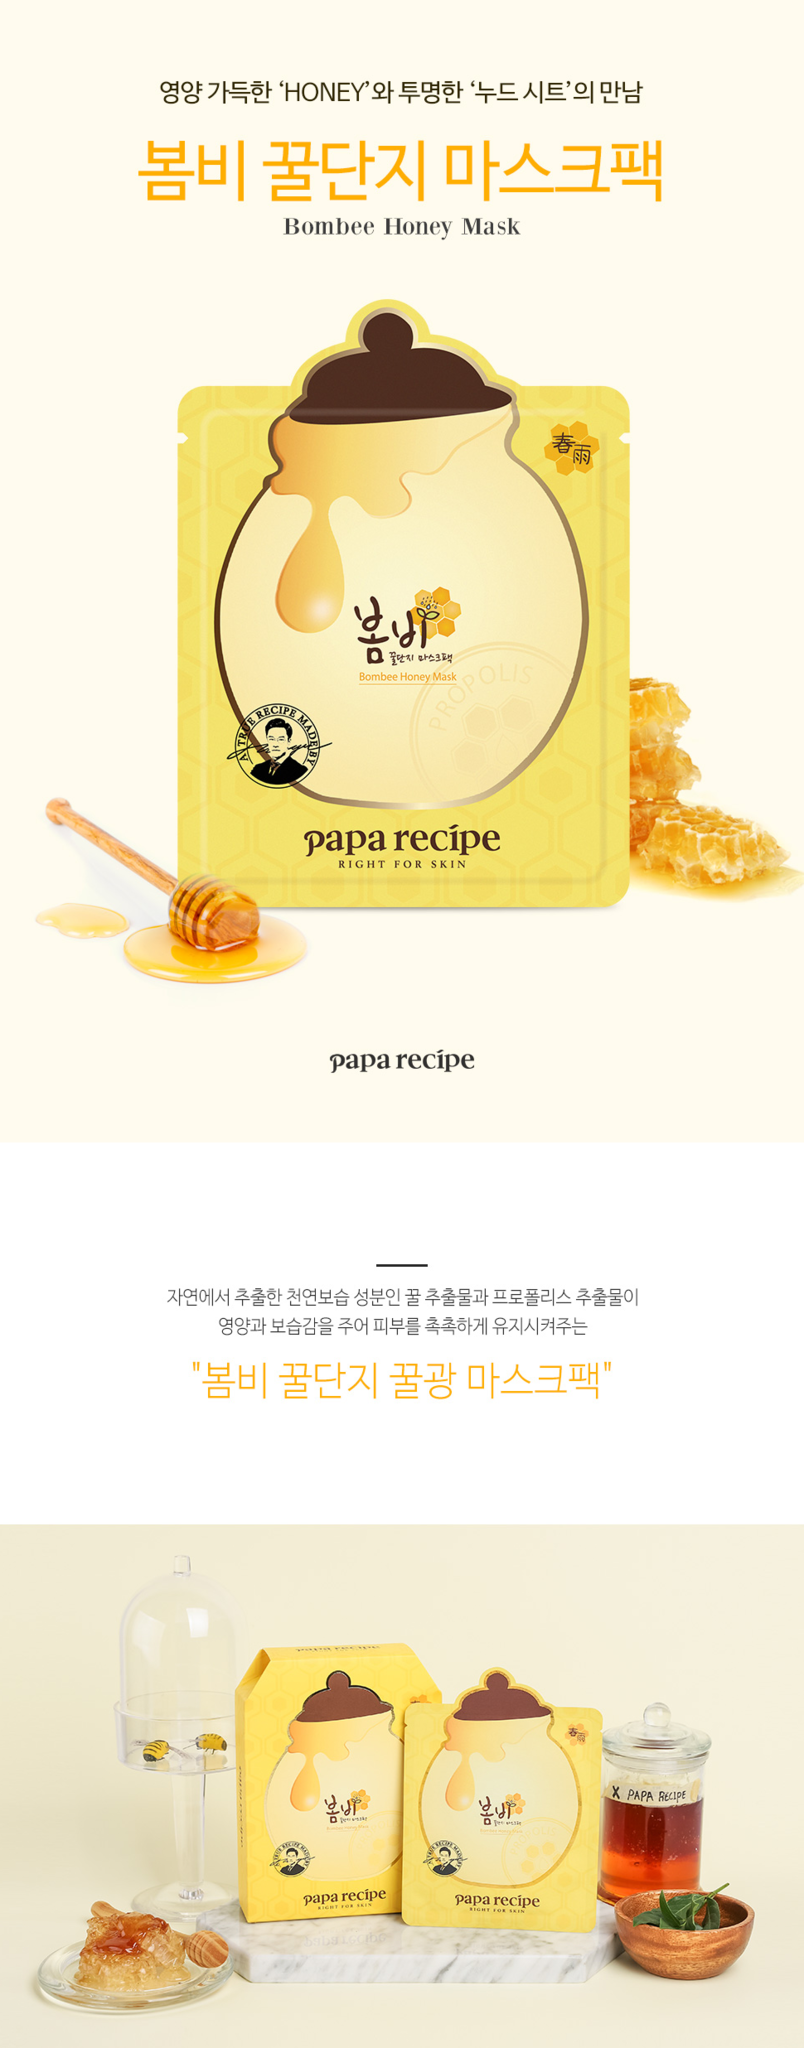 Bombee Honey Mask Probierset (5 Stk)-3